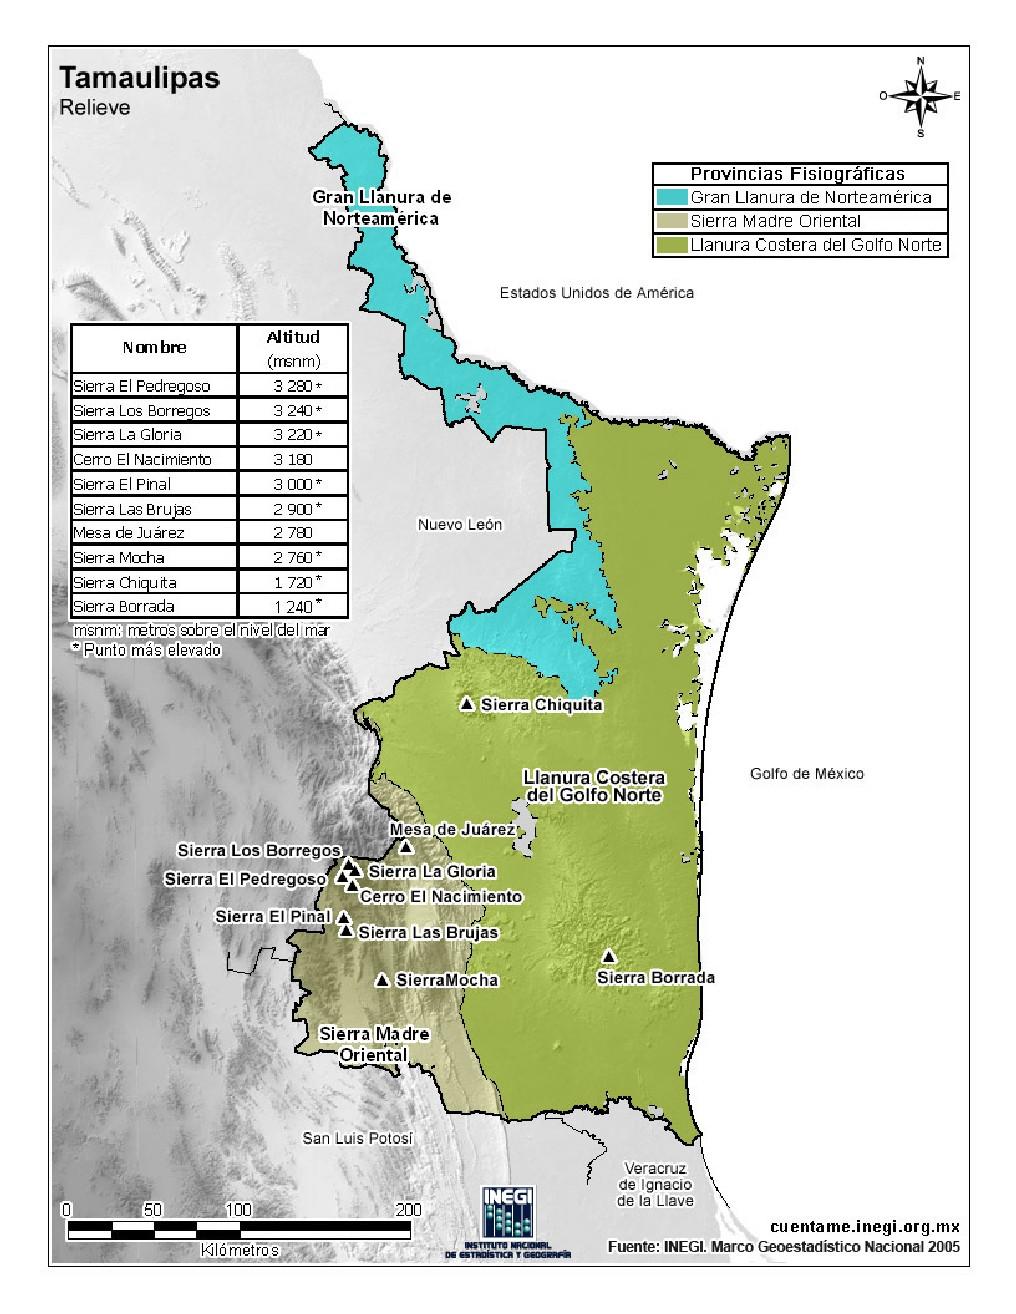 Mapa en color de montañas de Tamaulipas. INEGI de México